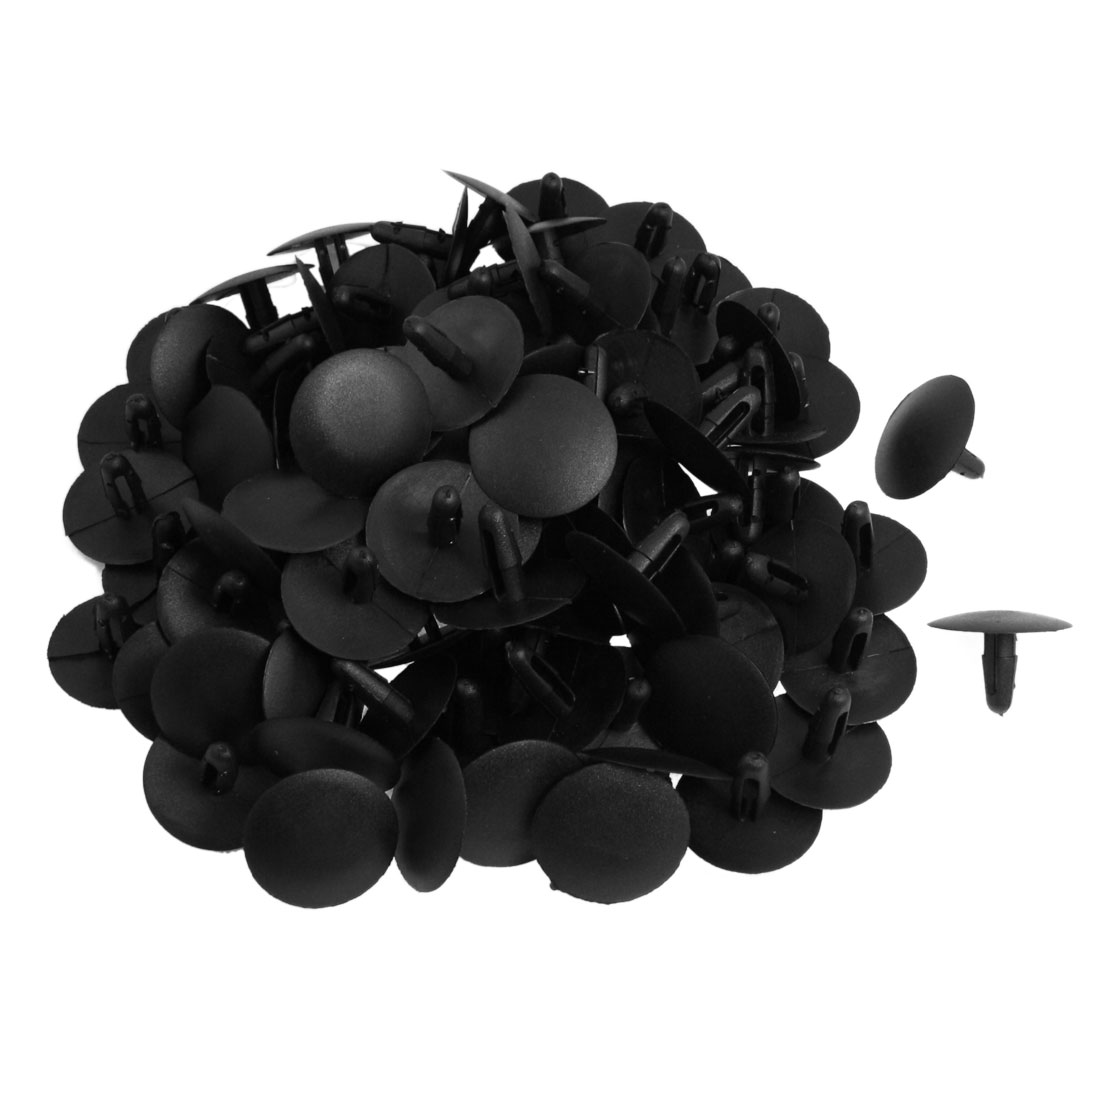 100 Pcs Car 30mm Round Head Black Plastic Rivet Fastener Push Clip for 7mm Hole